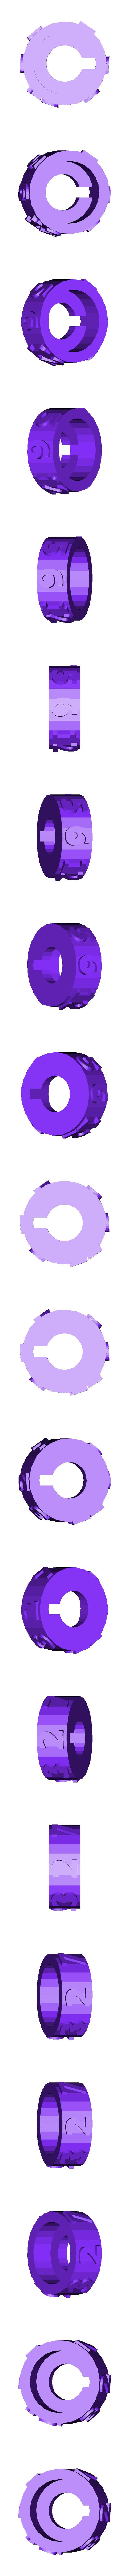 Wheel_1_separate.stl Download free STL file Series Puzzle • 3D printer model, Balkhnarb